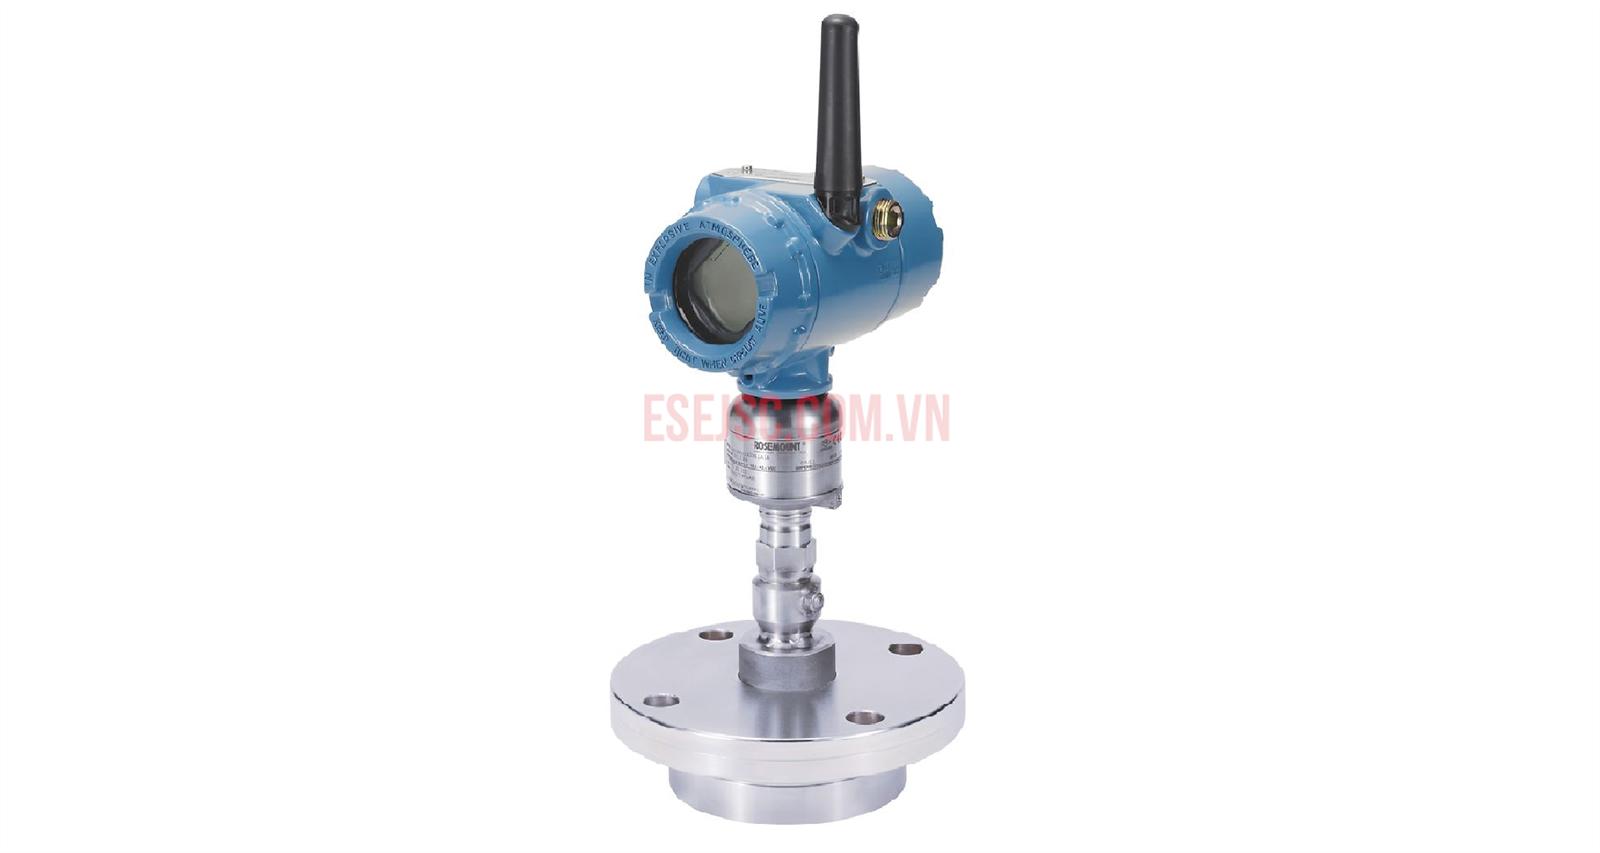 Bộ chuyển đổi tín hiệu áp suất Rosemount 3051SAL